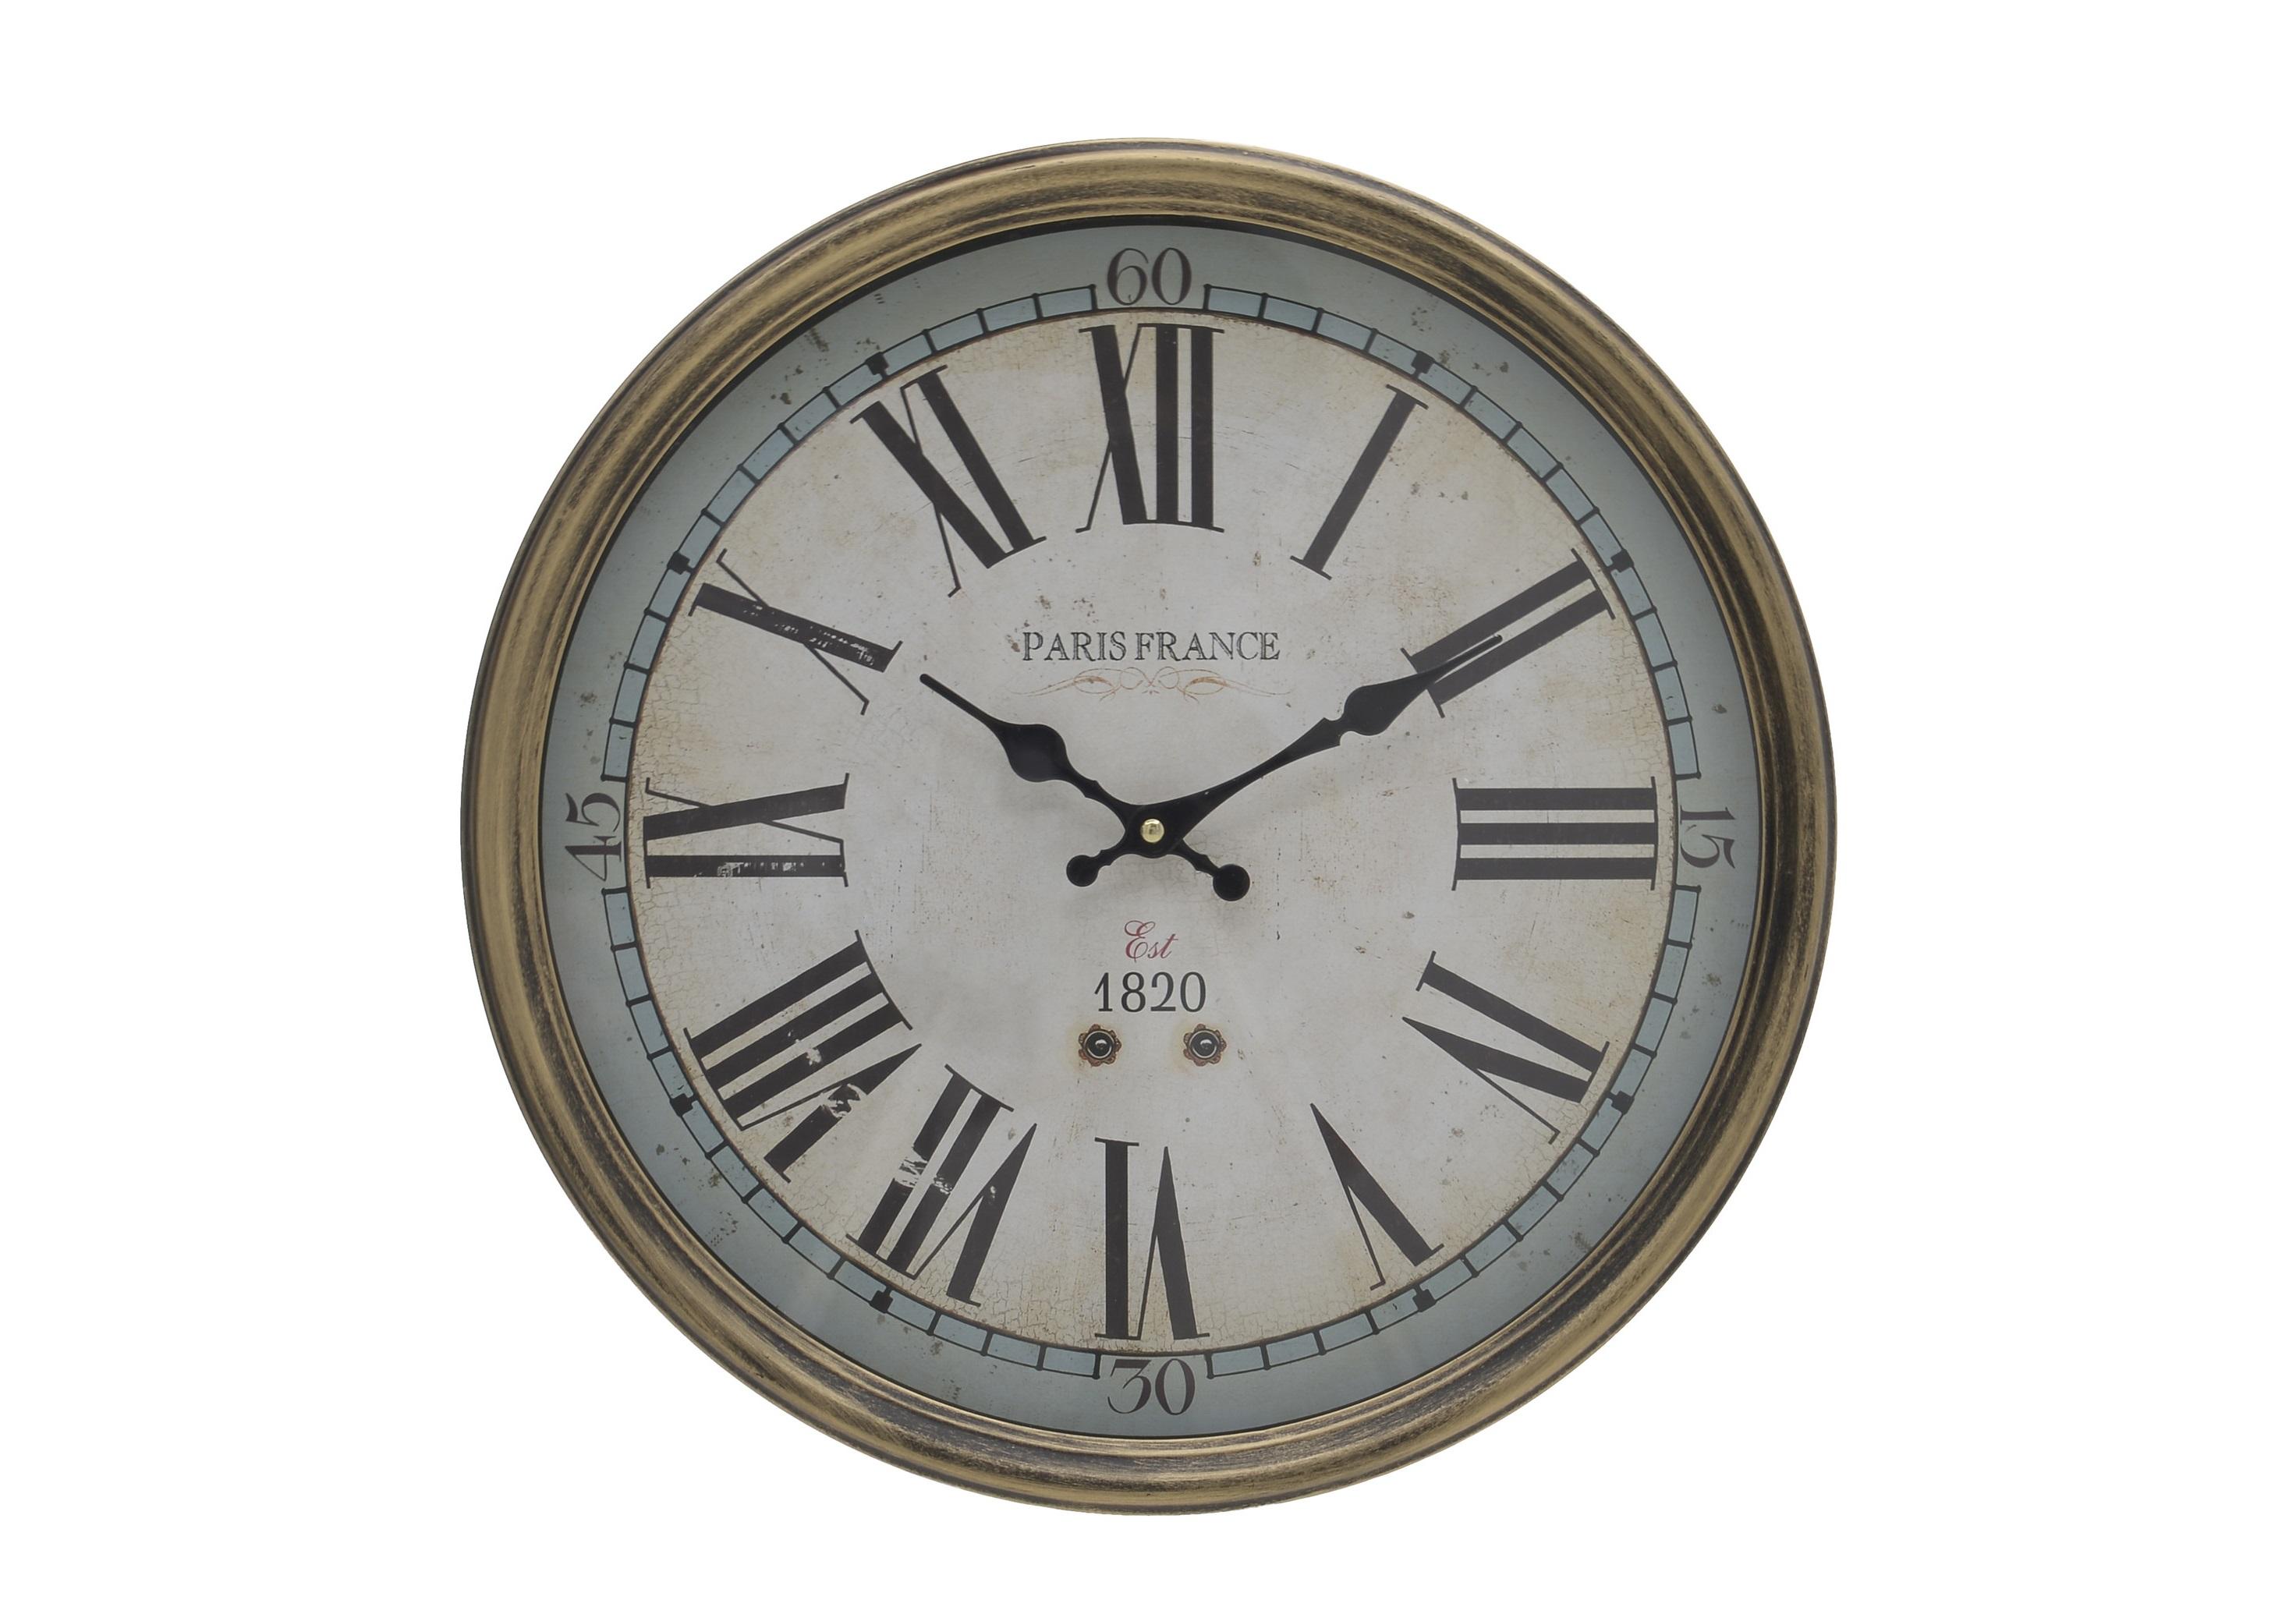 Часы настенные EmmaleeНастенные часы<br>Кварцевый механизм.<br><br>Material: Дерево<br>Ширина см: 40.0<br>Высота см: 40.0<br>Глубина см: 5.5